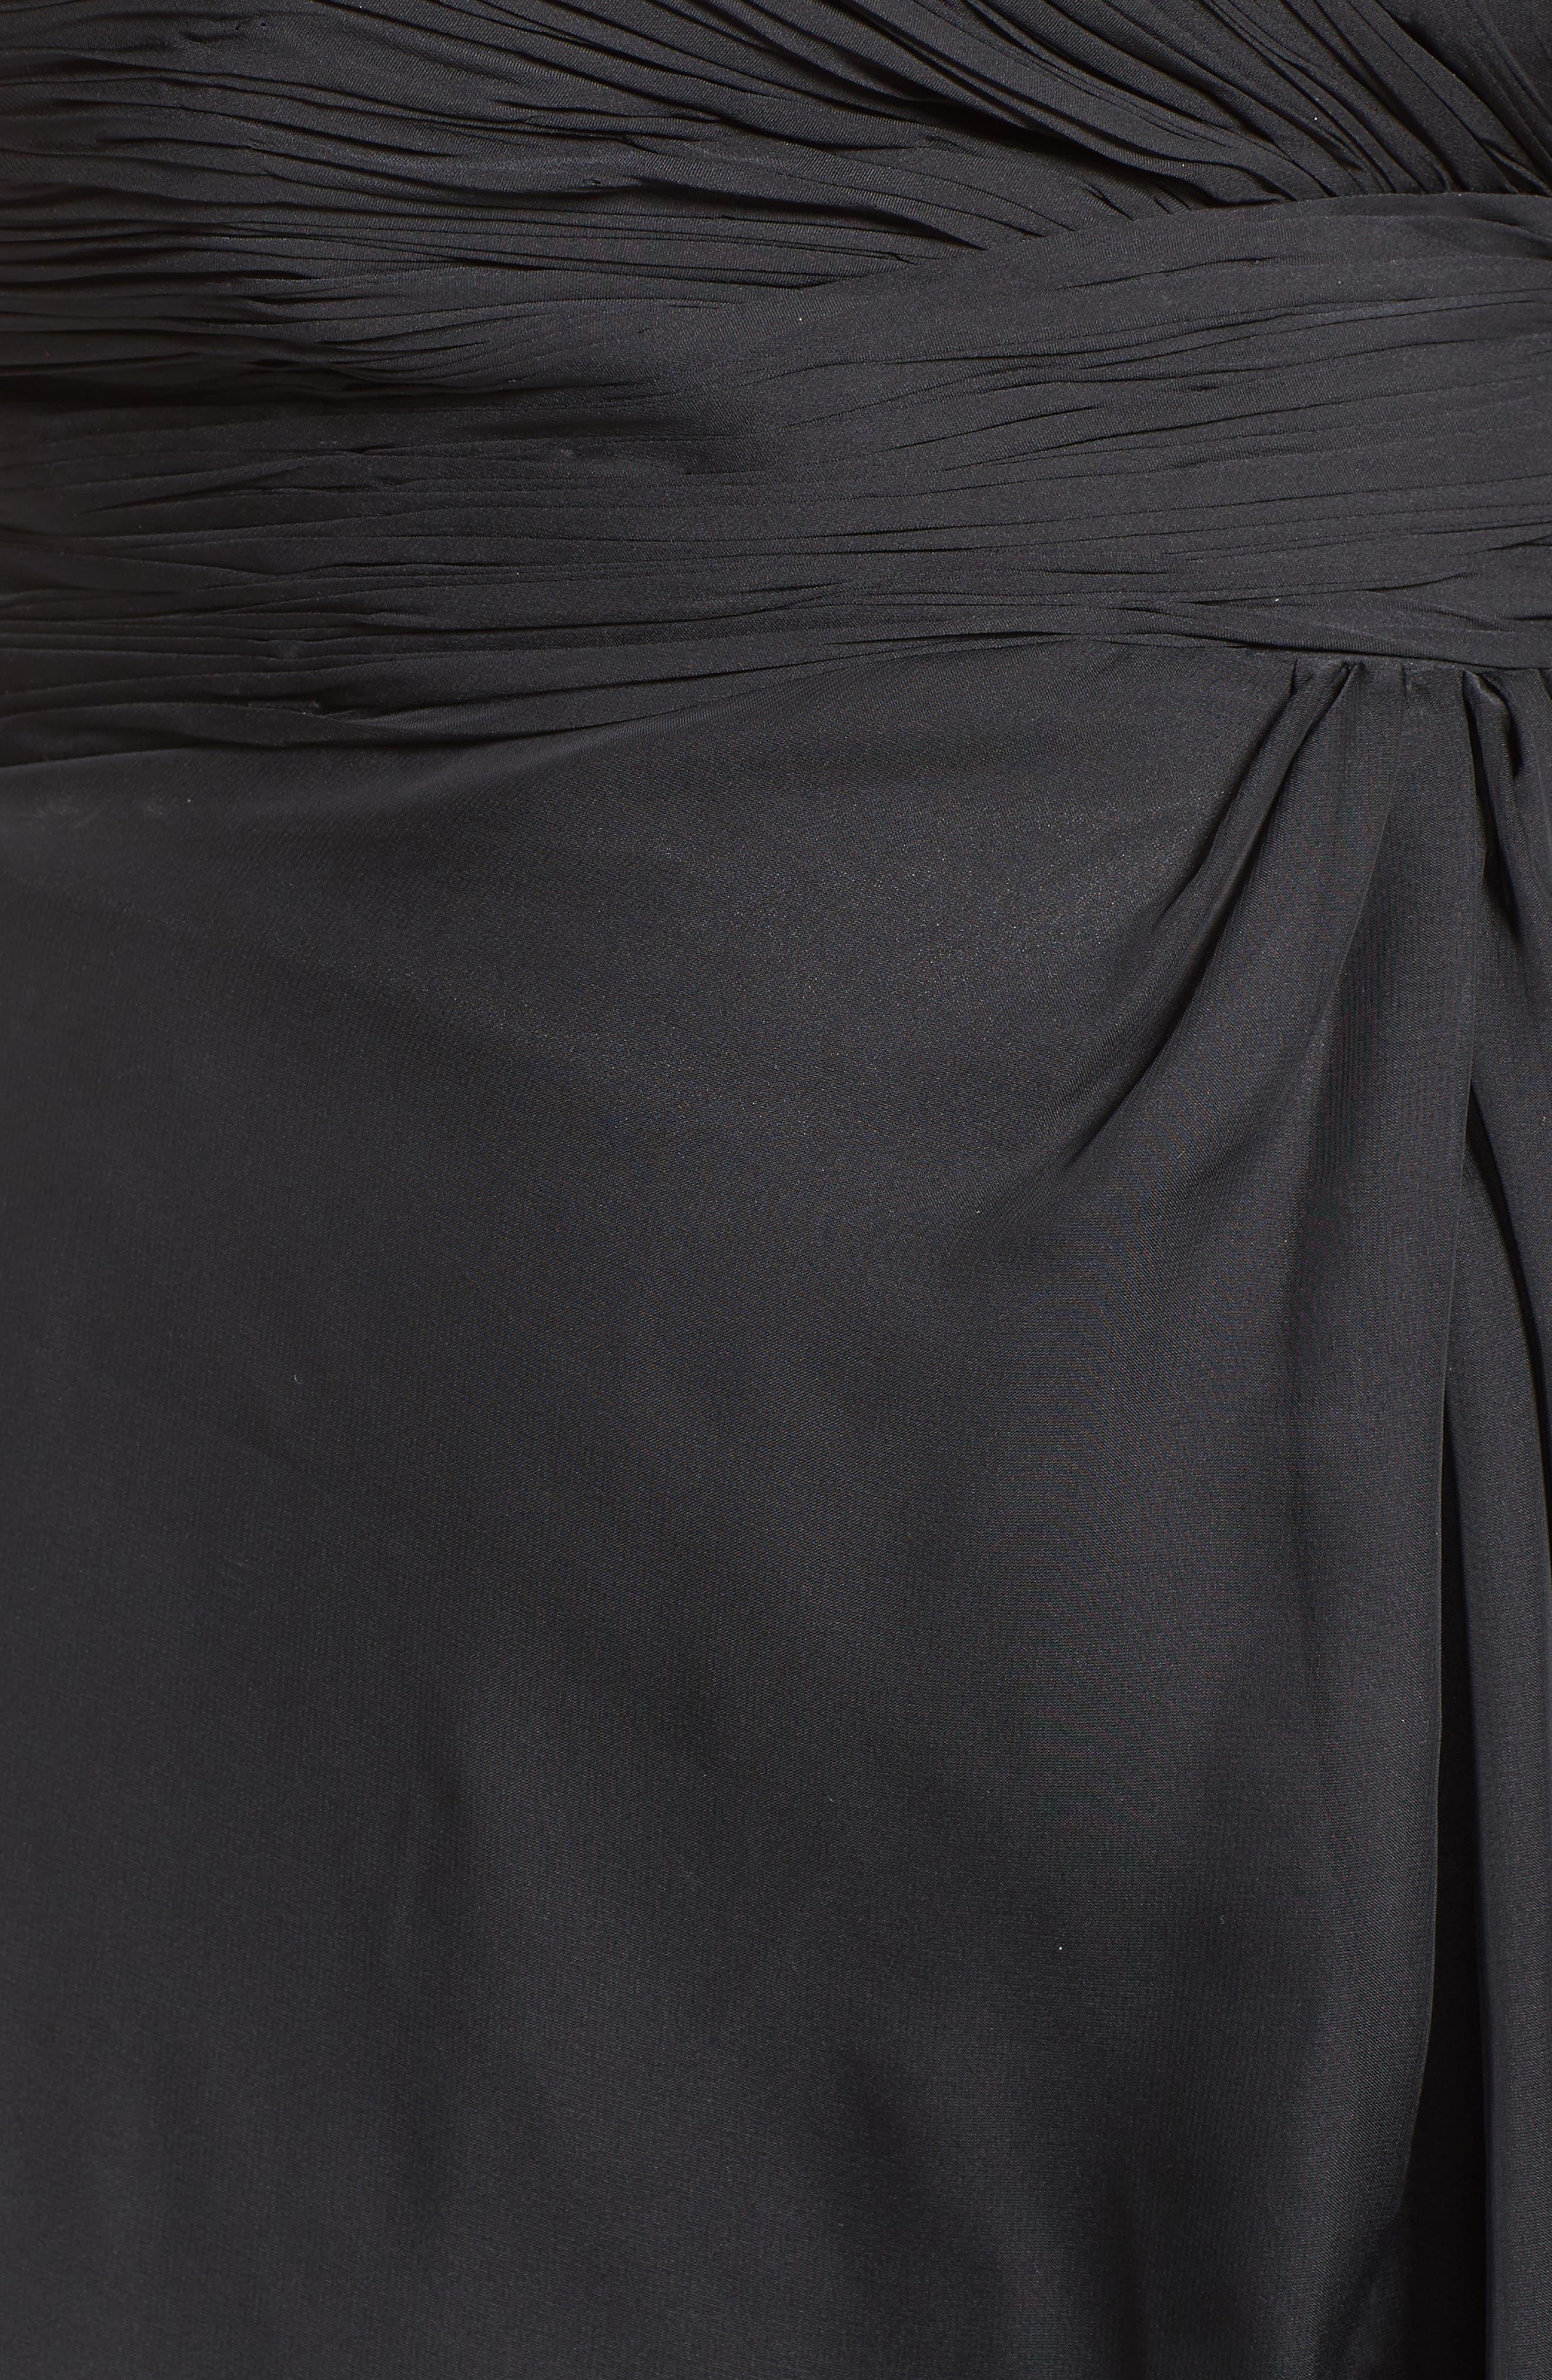 Embellished Goddess Gown,                             Alternate thumbnail 5, color,                             001